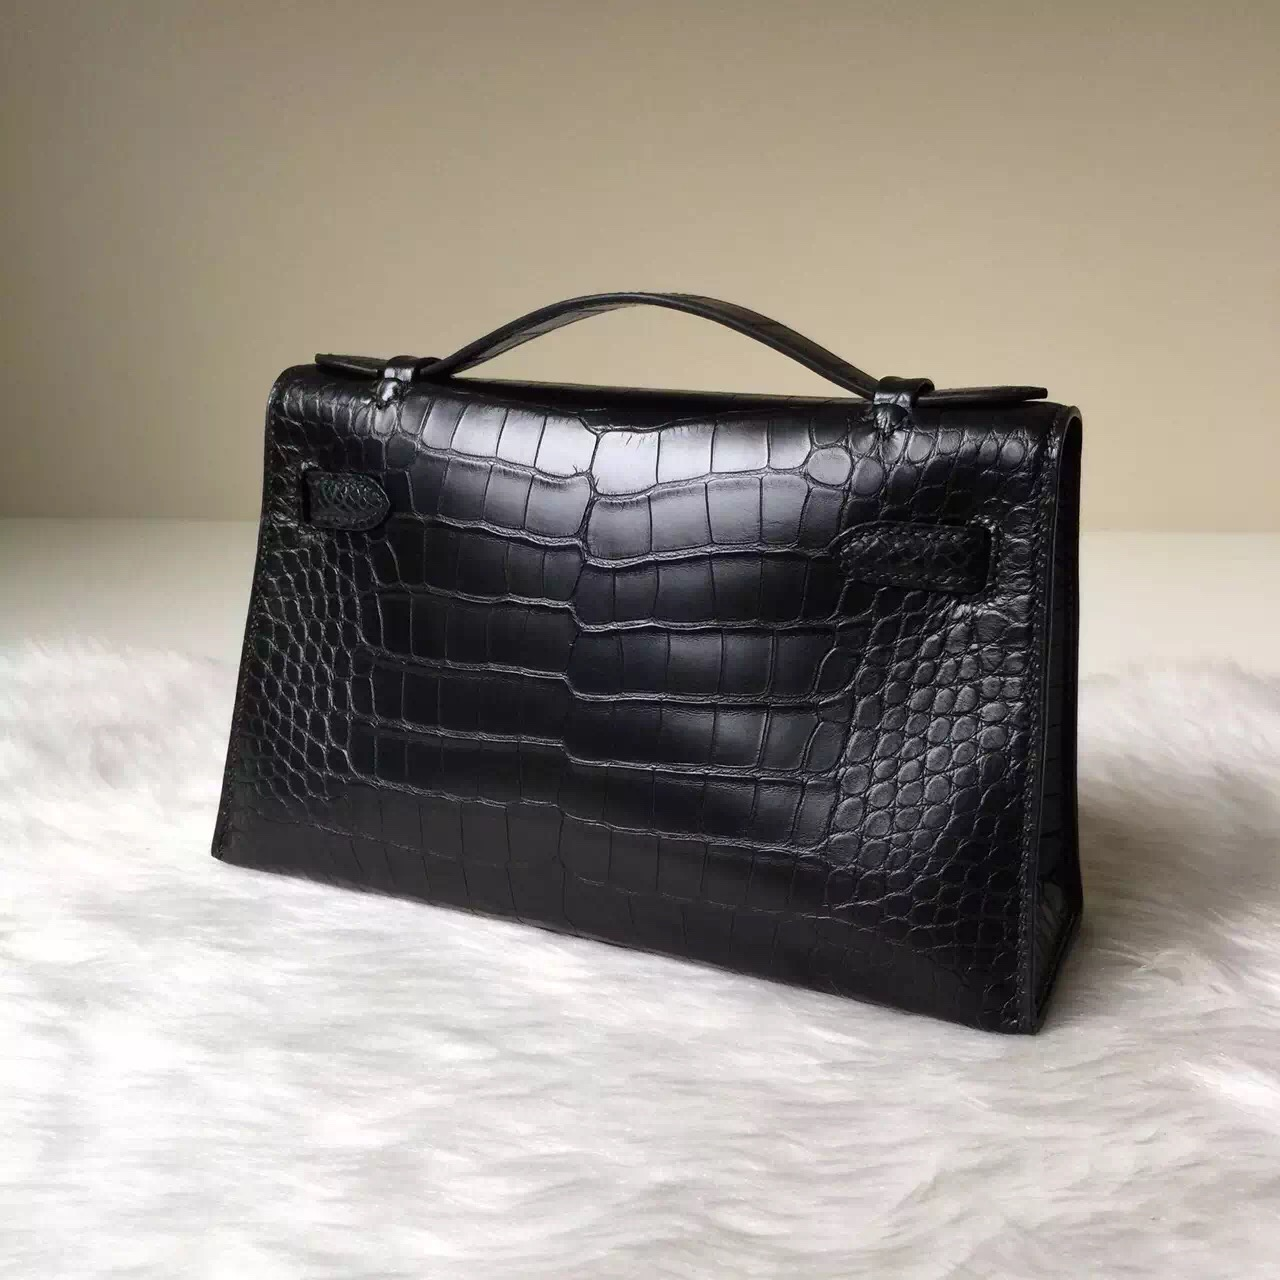 Sale Hermes CK89 Black Crocodile Matt Leather MiniKelly Bag 22cm